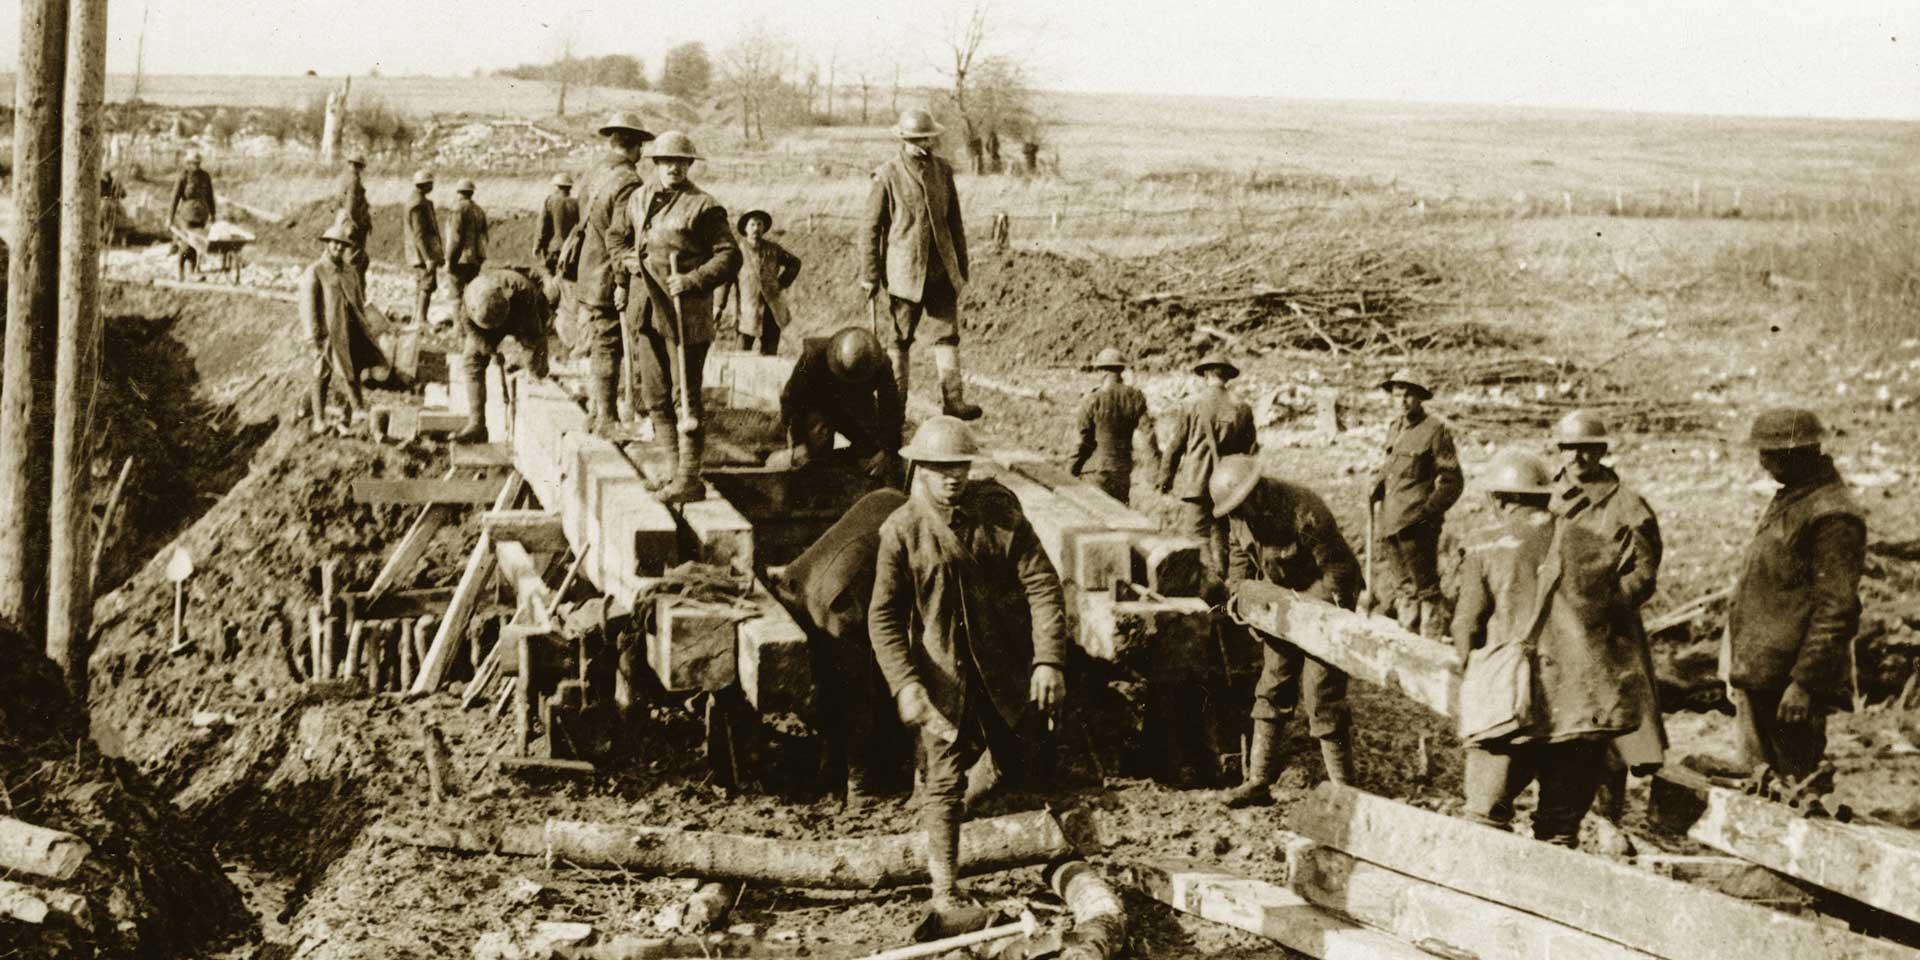 Royal Engineers bridging a stream, c1917